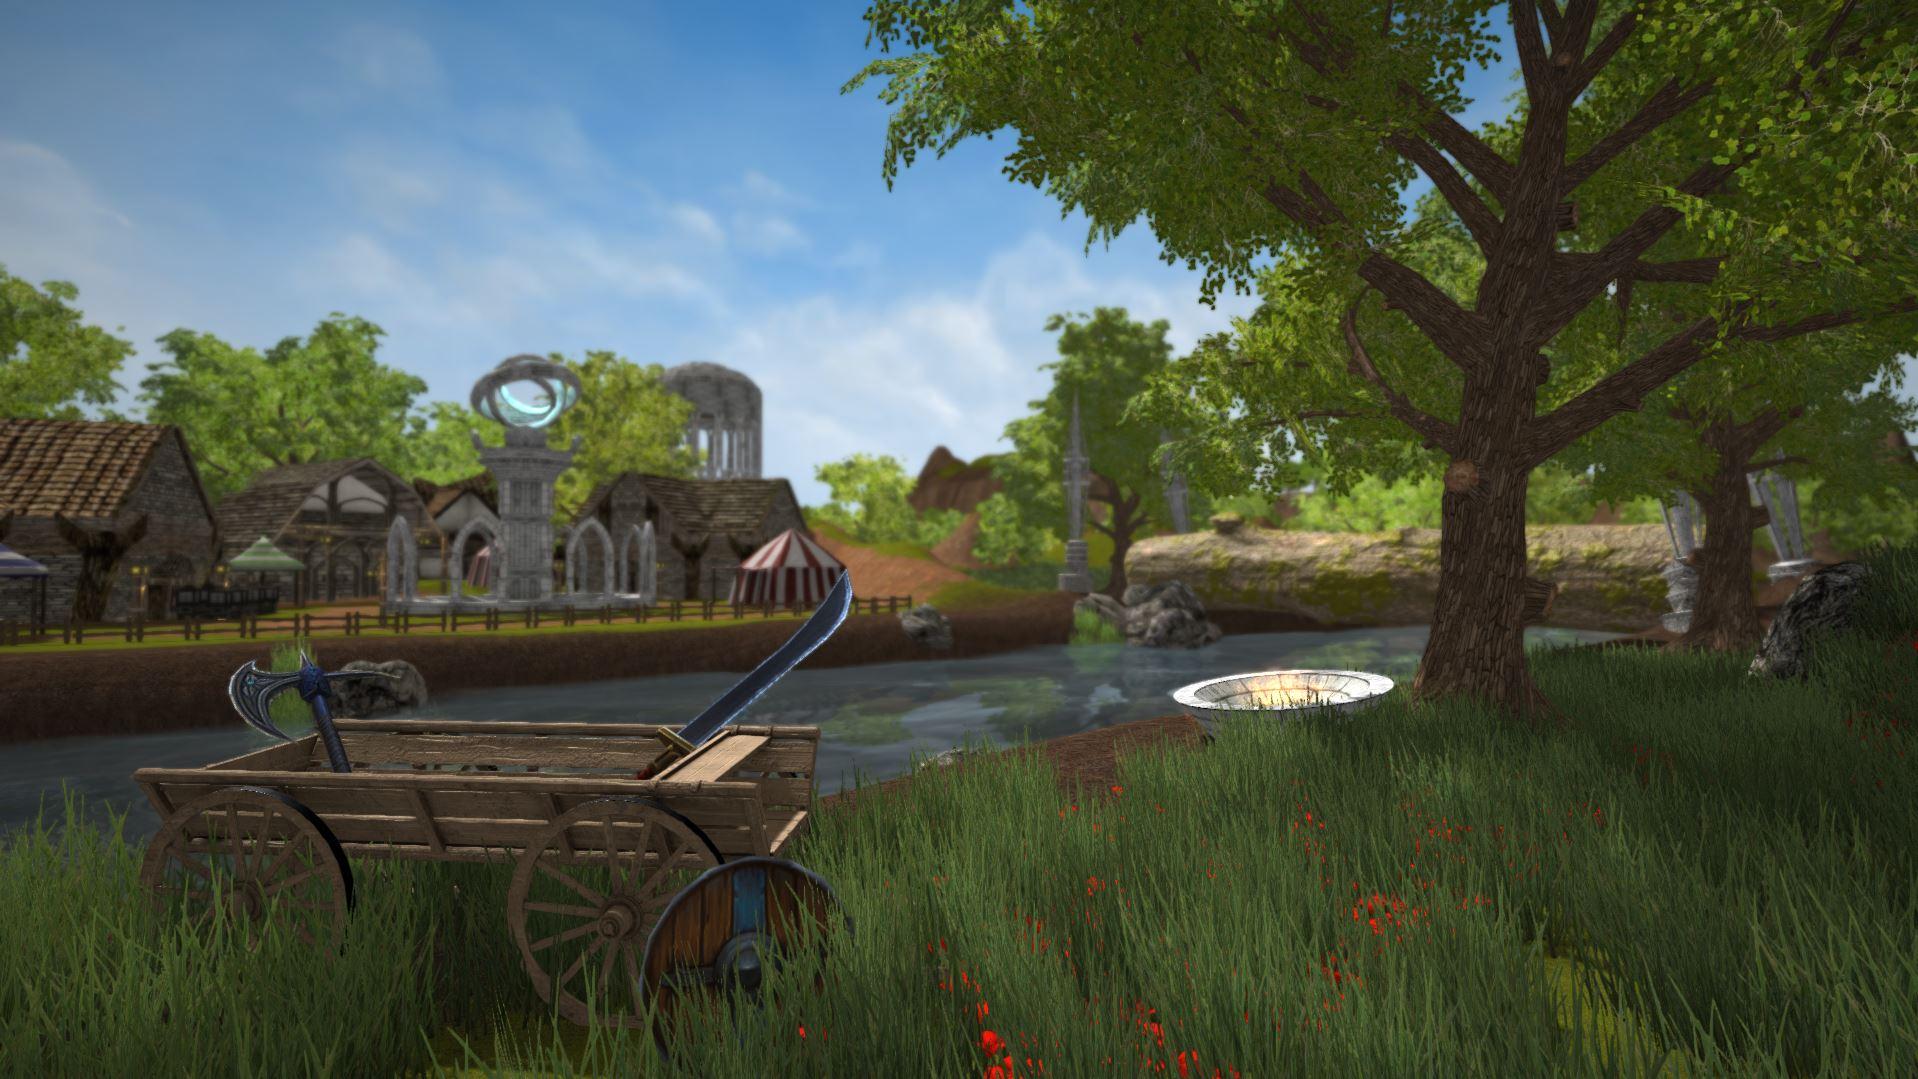 Artuax village image - Age of Aincrad (AoA) - Mod DB